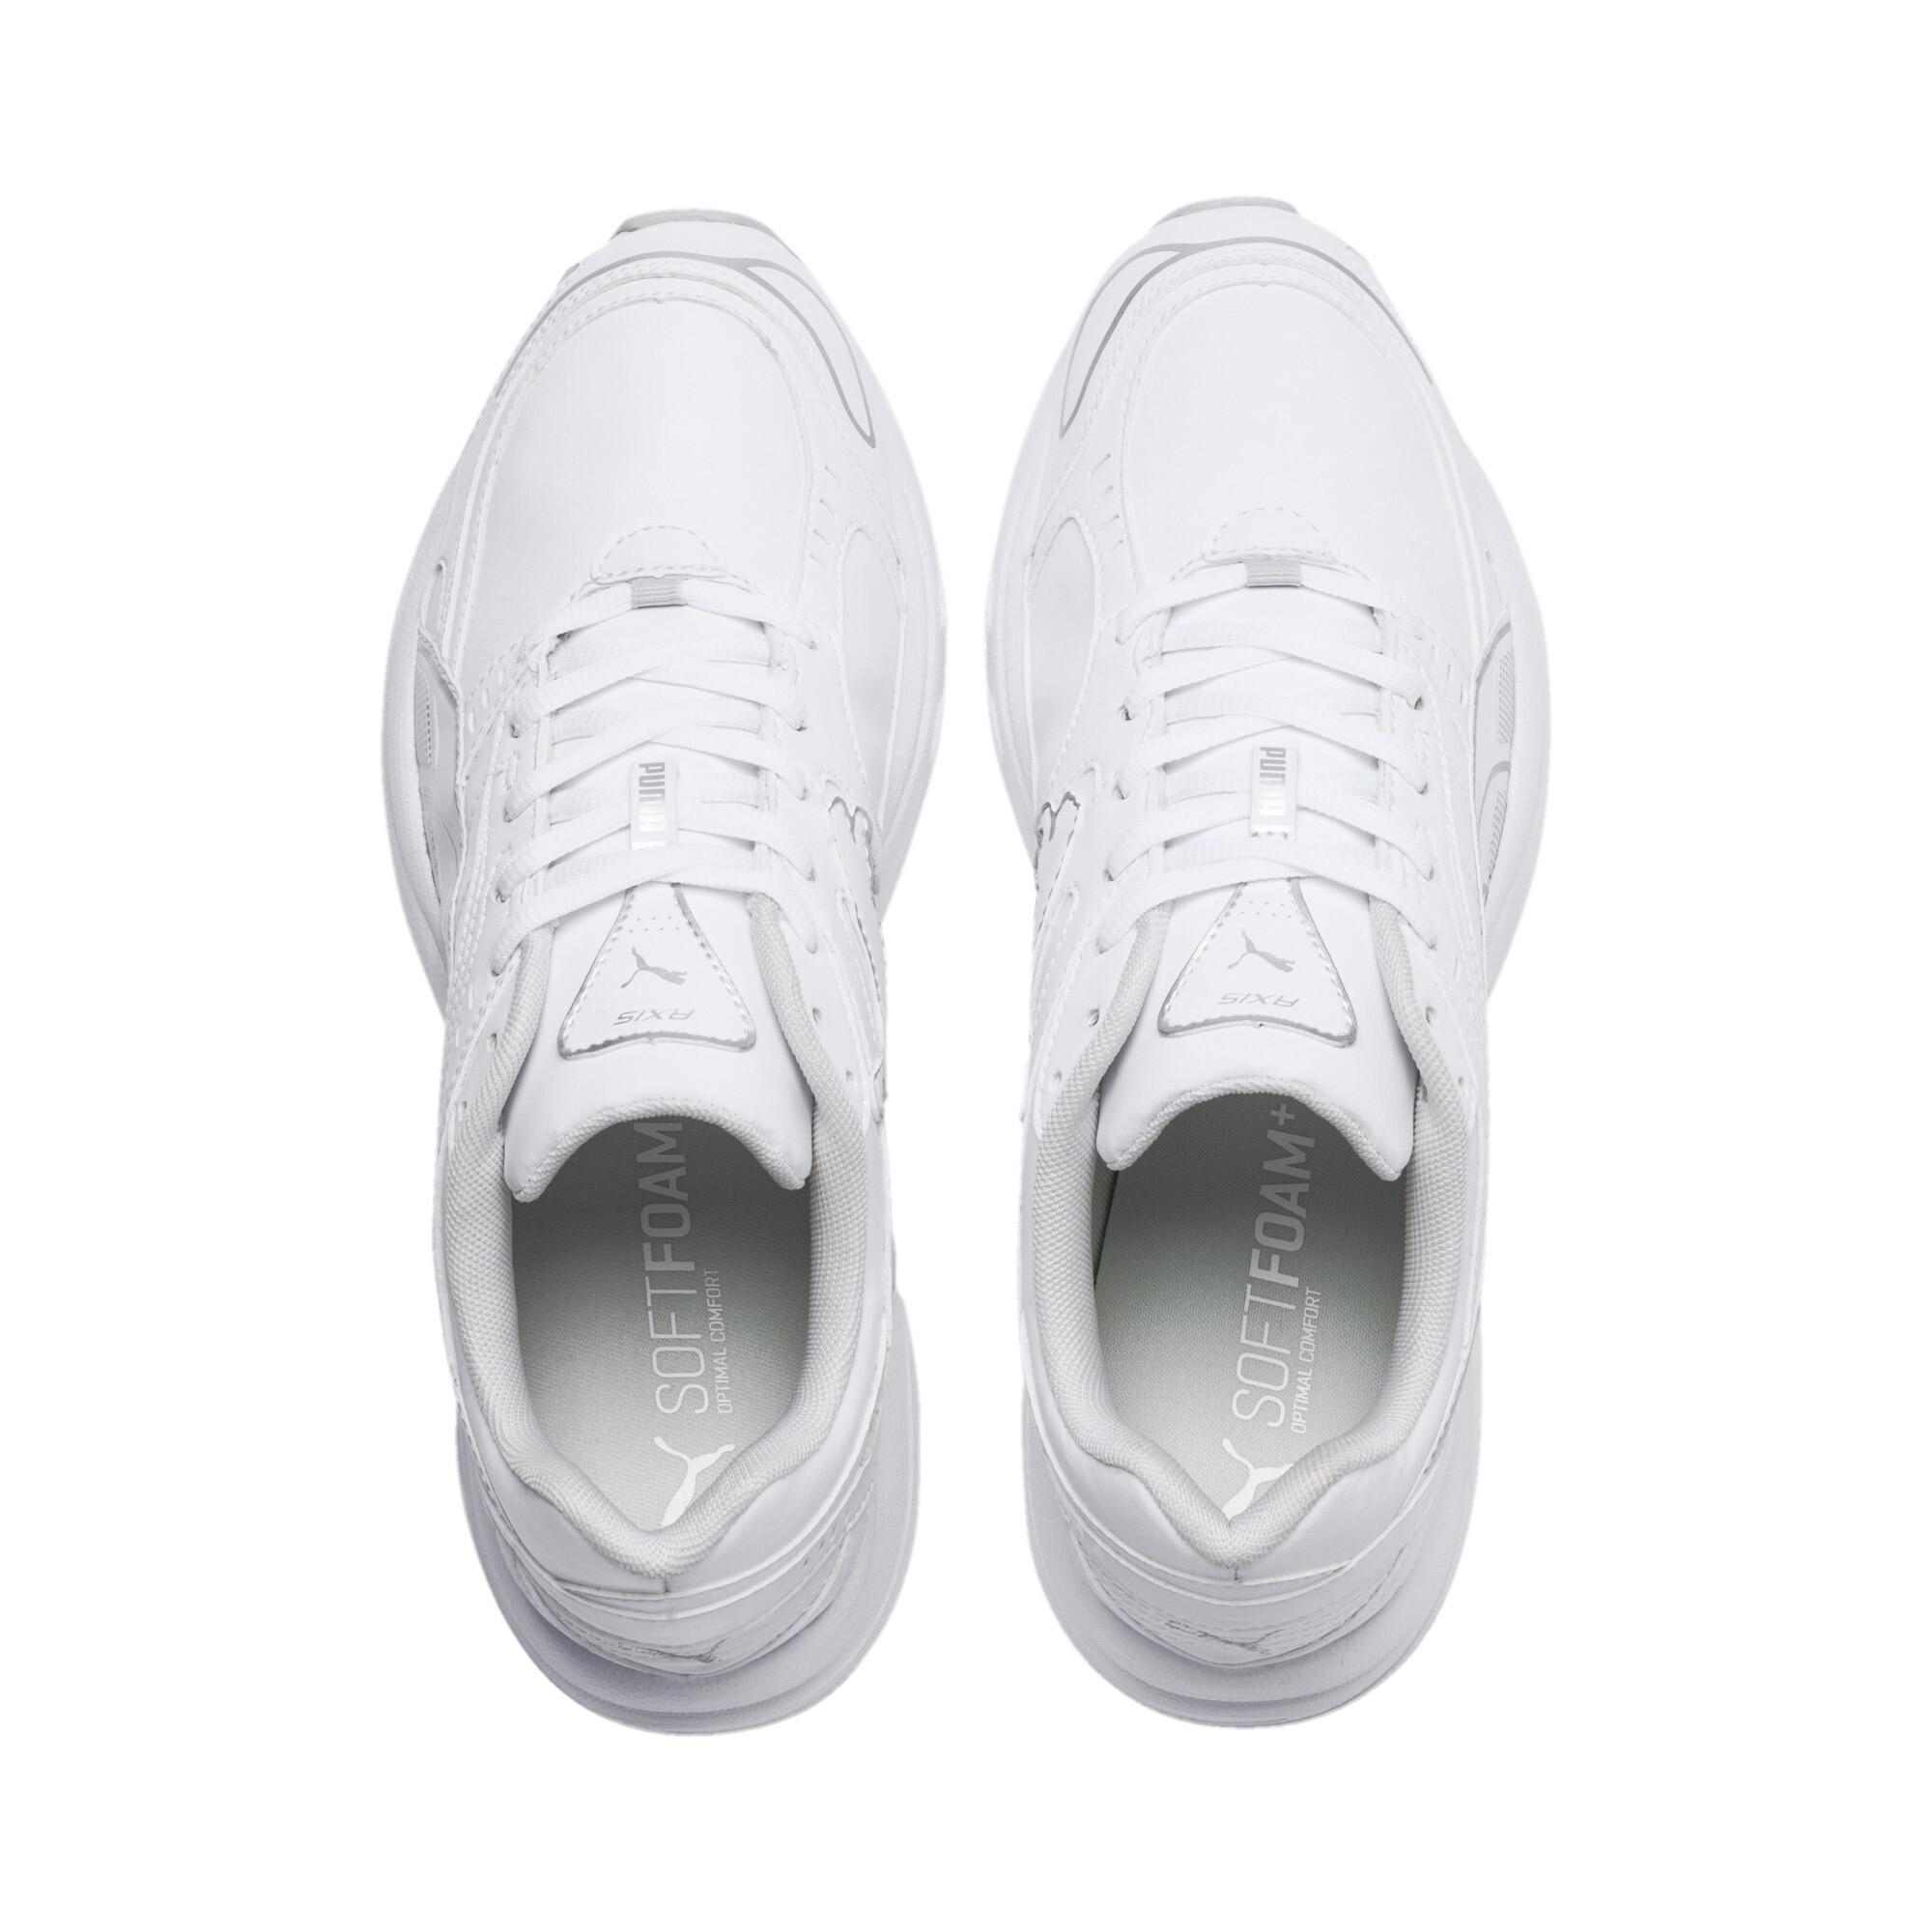 PUMA-Men-039-s-Axis-SL-Sneakers thumbnail 7